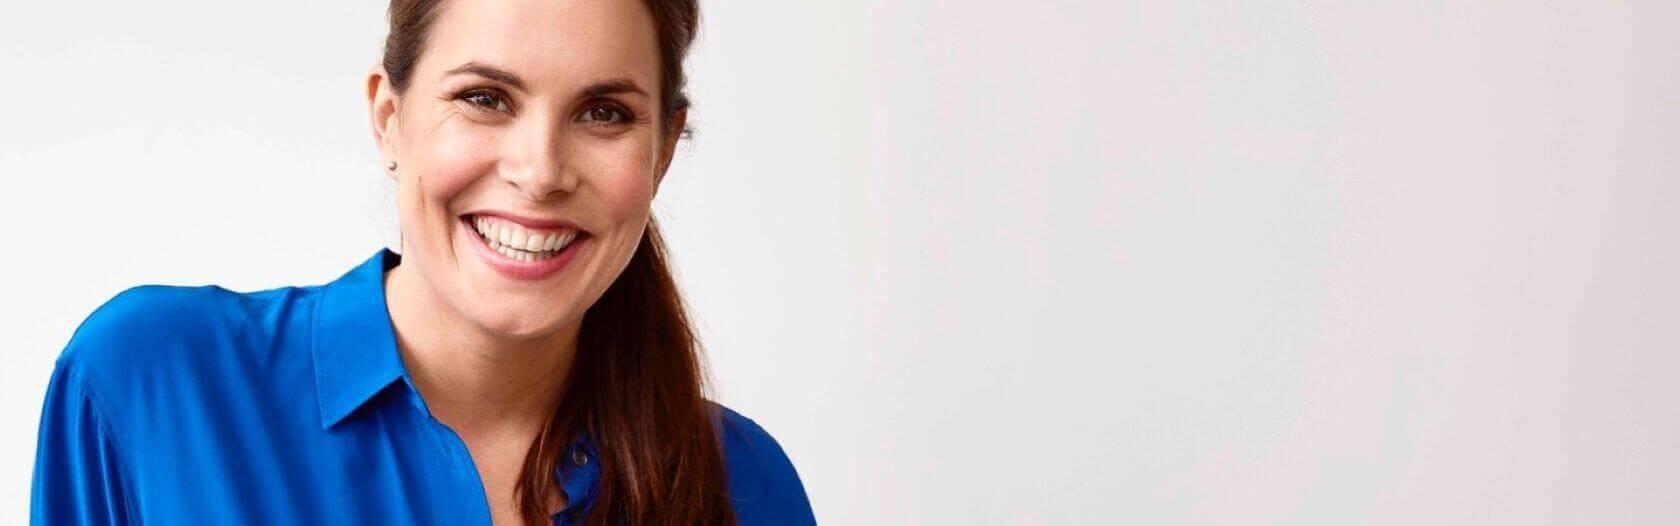 Vrouw met blauwe blouse